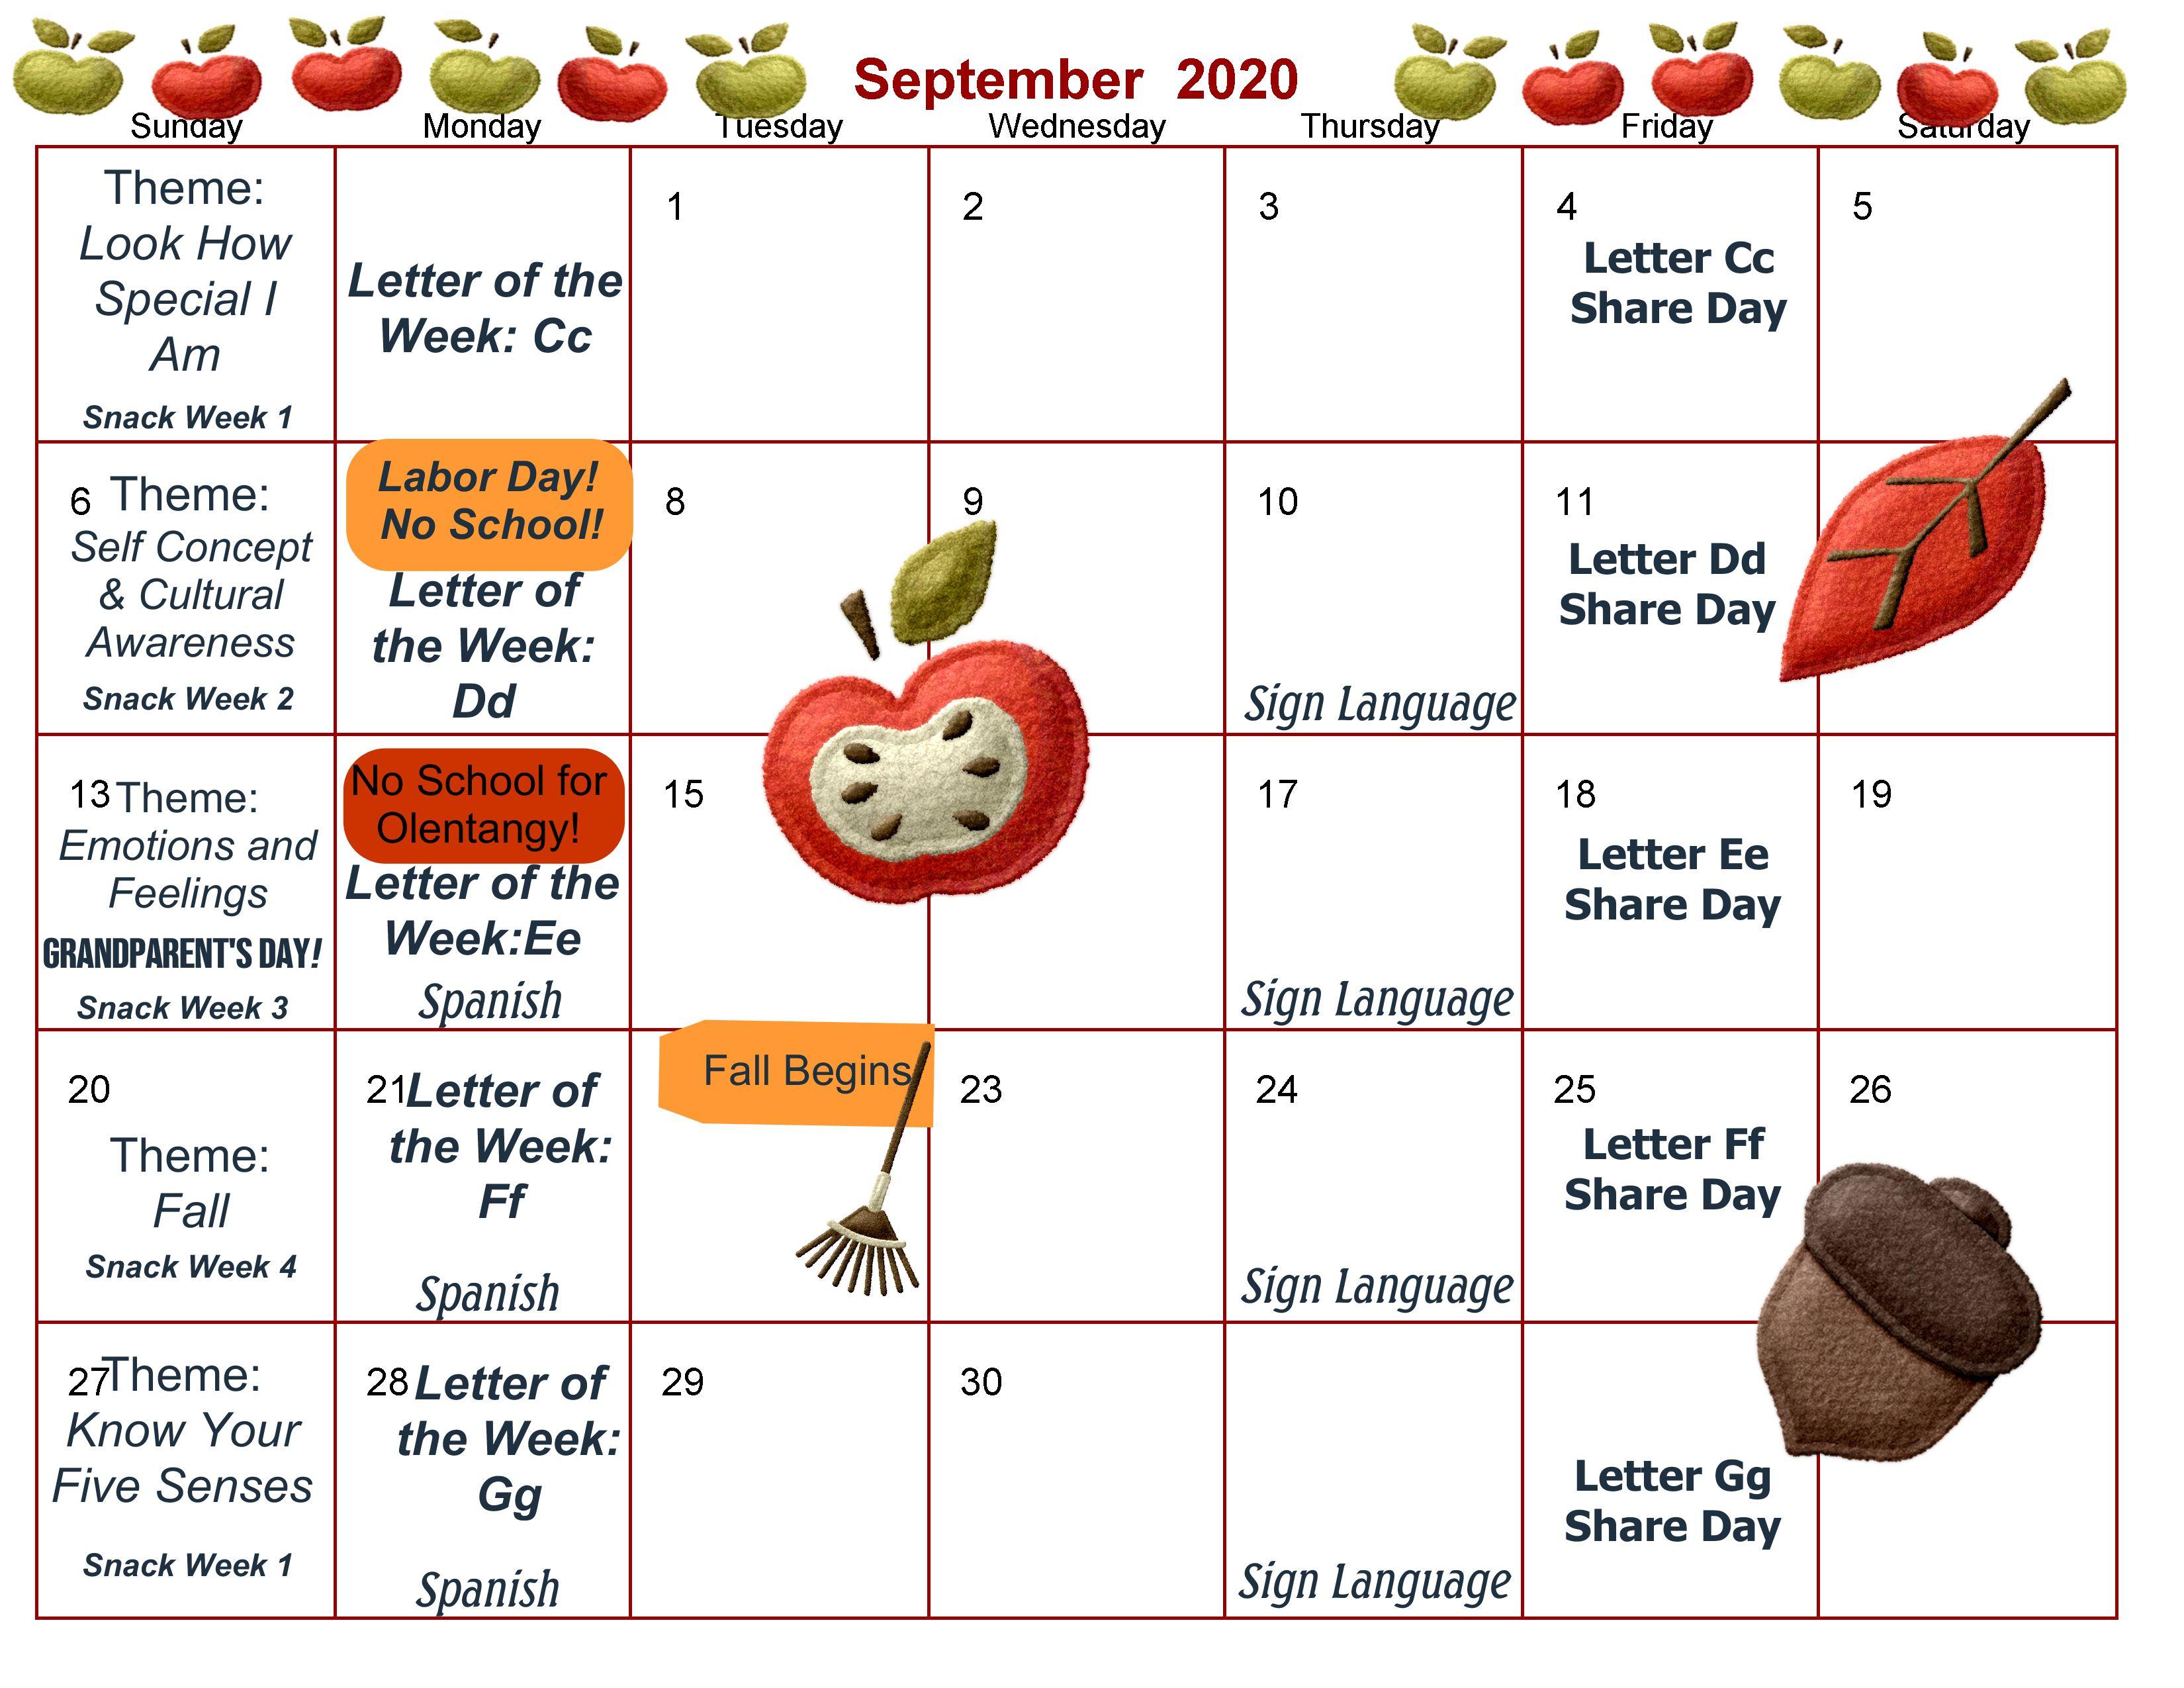 2020-9 BH September Calendar-001.jpg